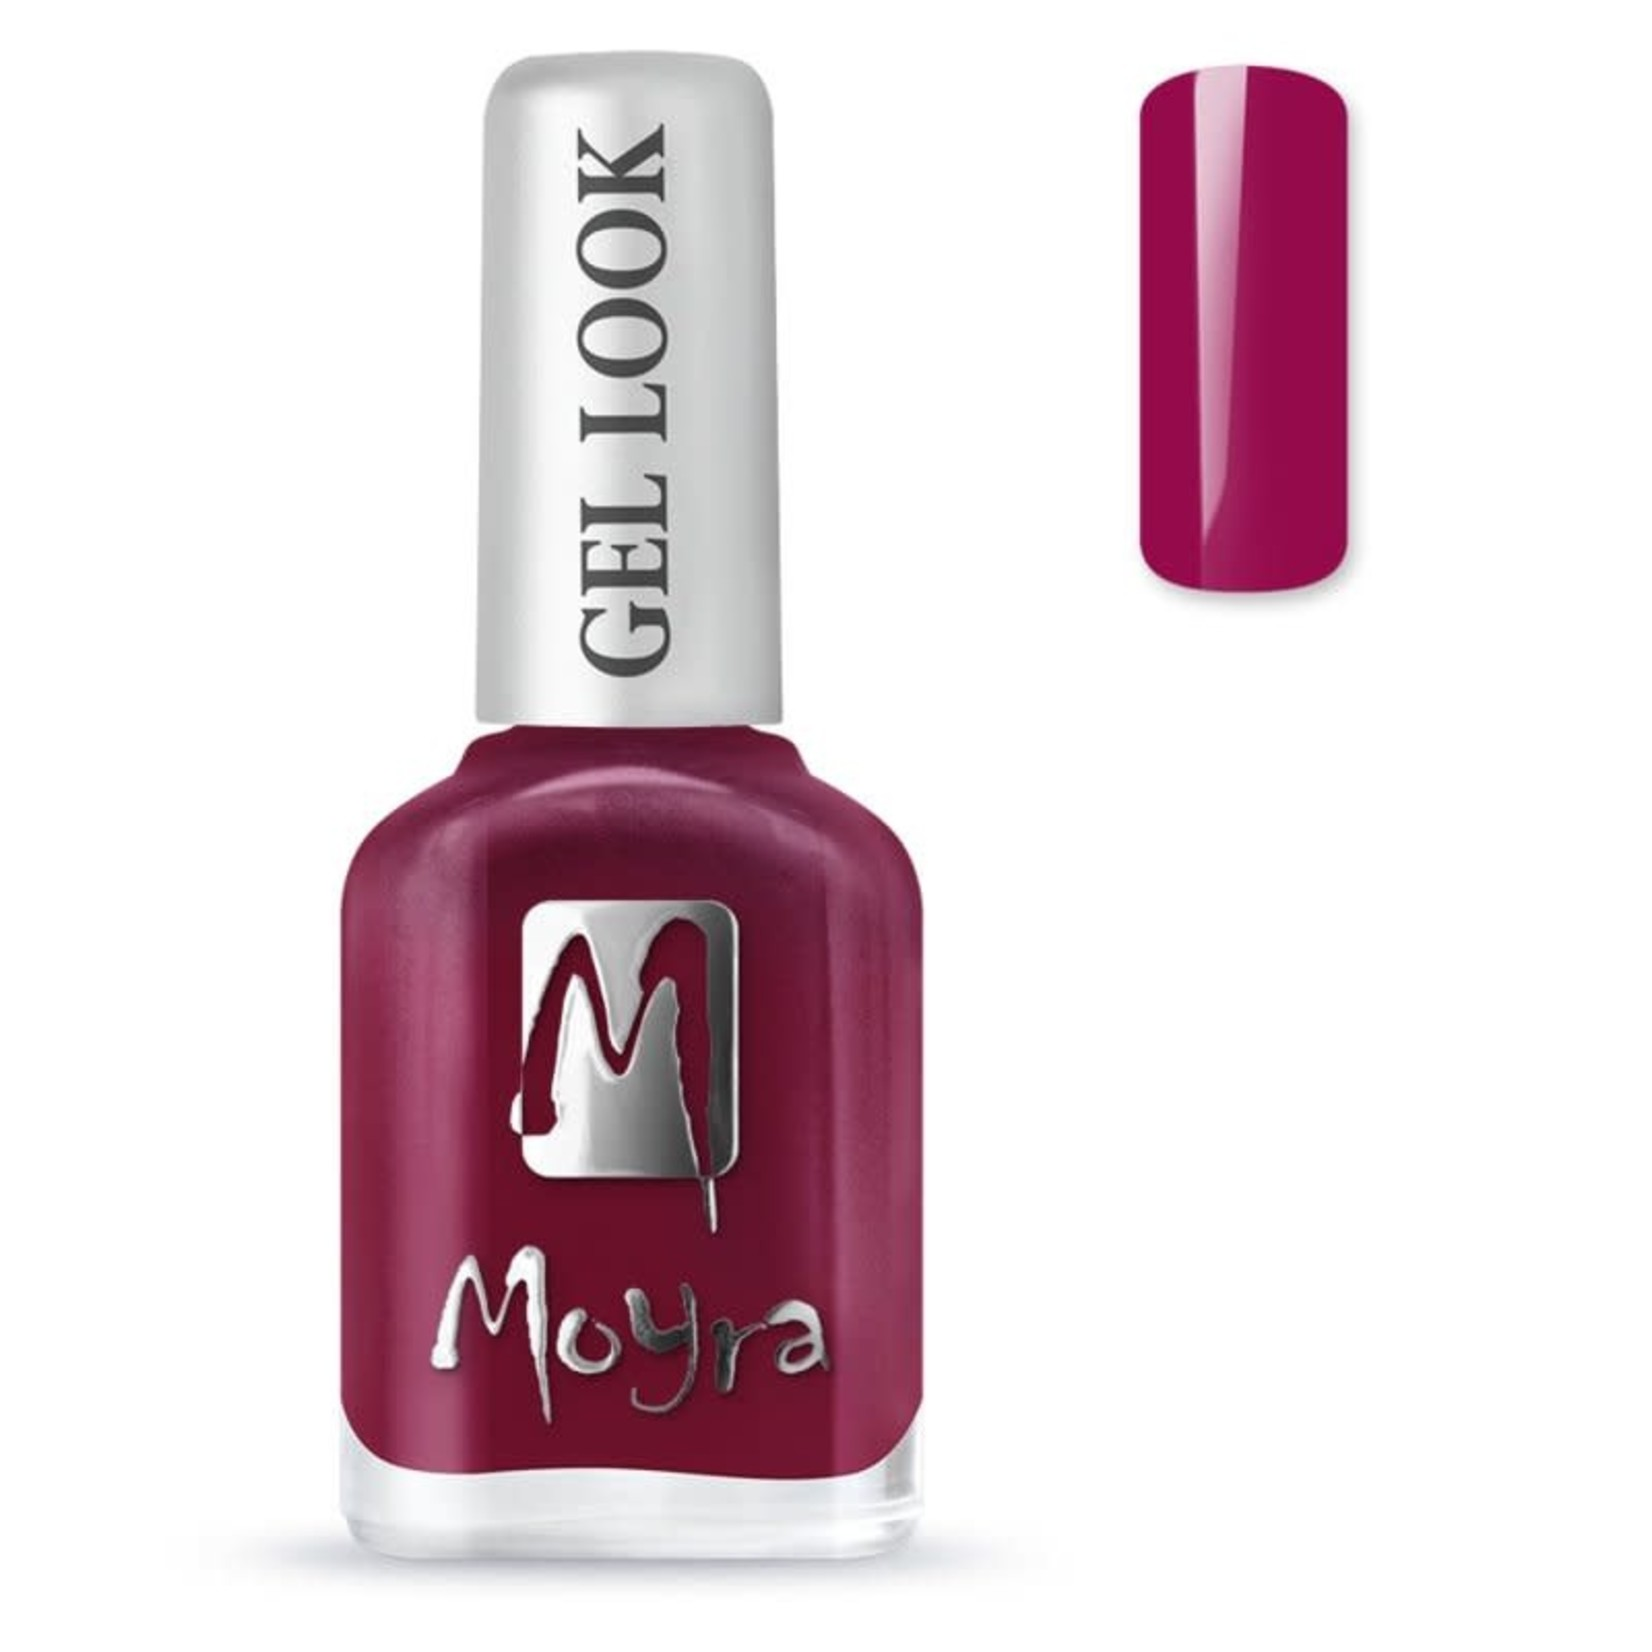 Moyra Moyra Gel Look nail polish 1031 Fanny